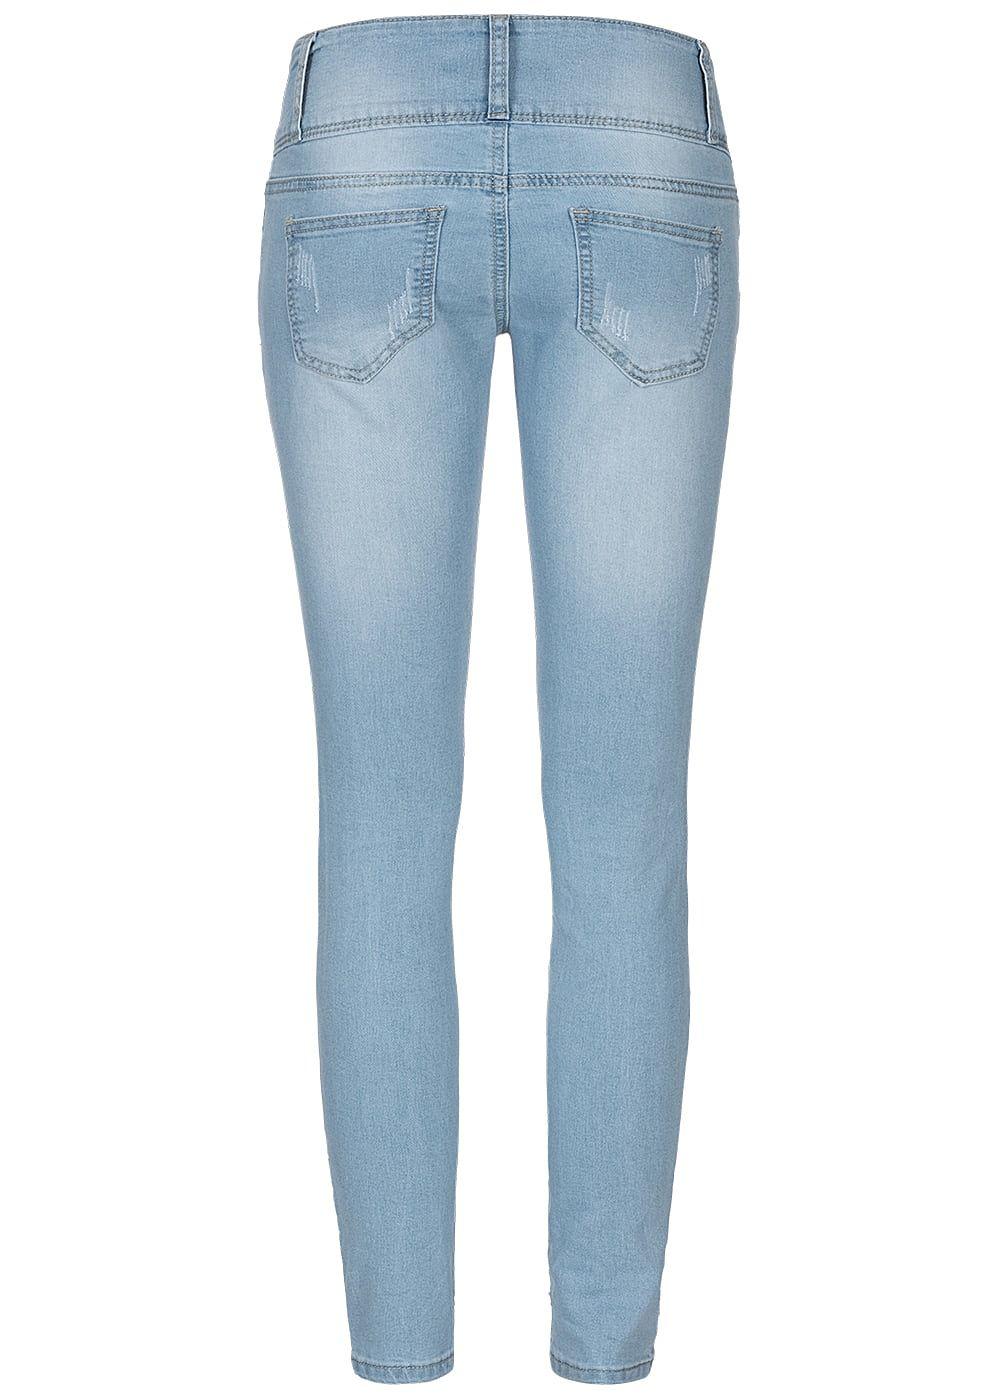 42a1ee95886e14 Seventyseven Lifestyle Damen Skinny Jeans 4-Pockets Heavy Destroy ...